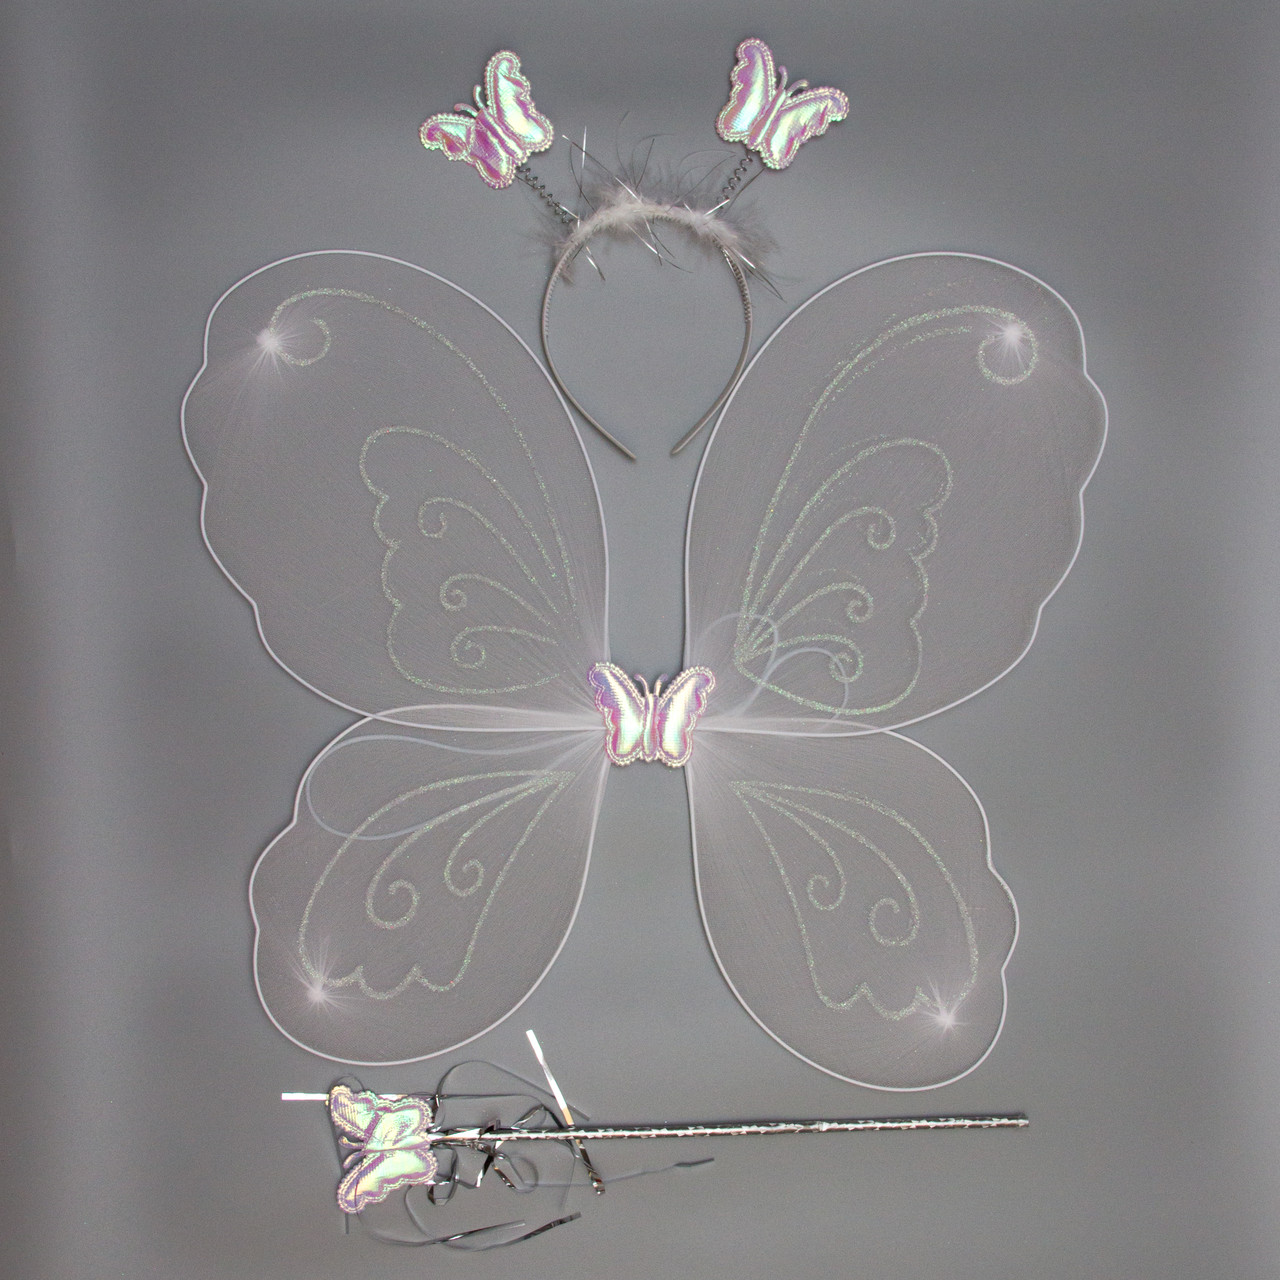 Карнавальный костюм бабочка, белый (HLJ170419-18-5)